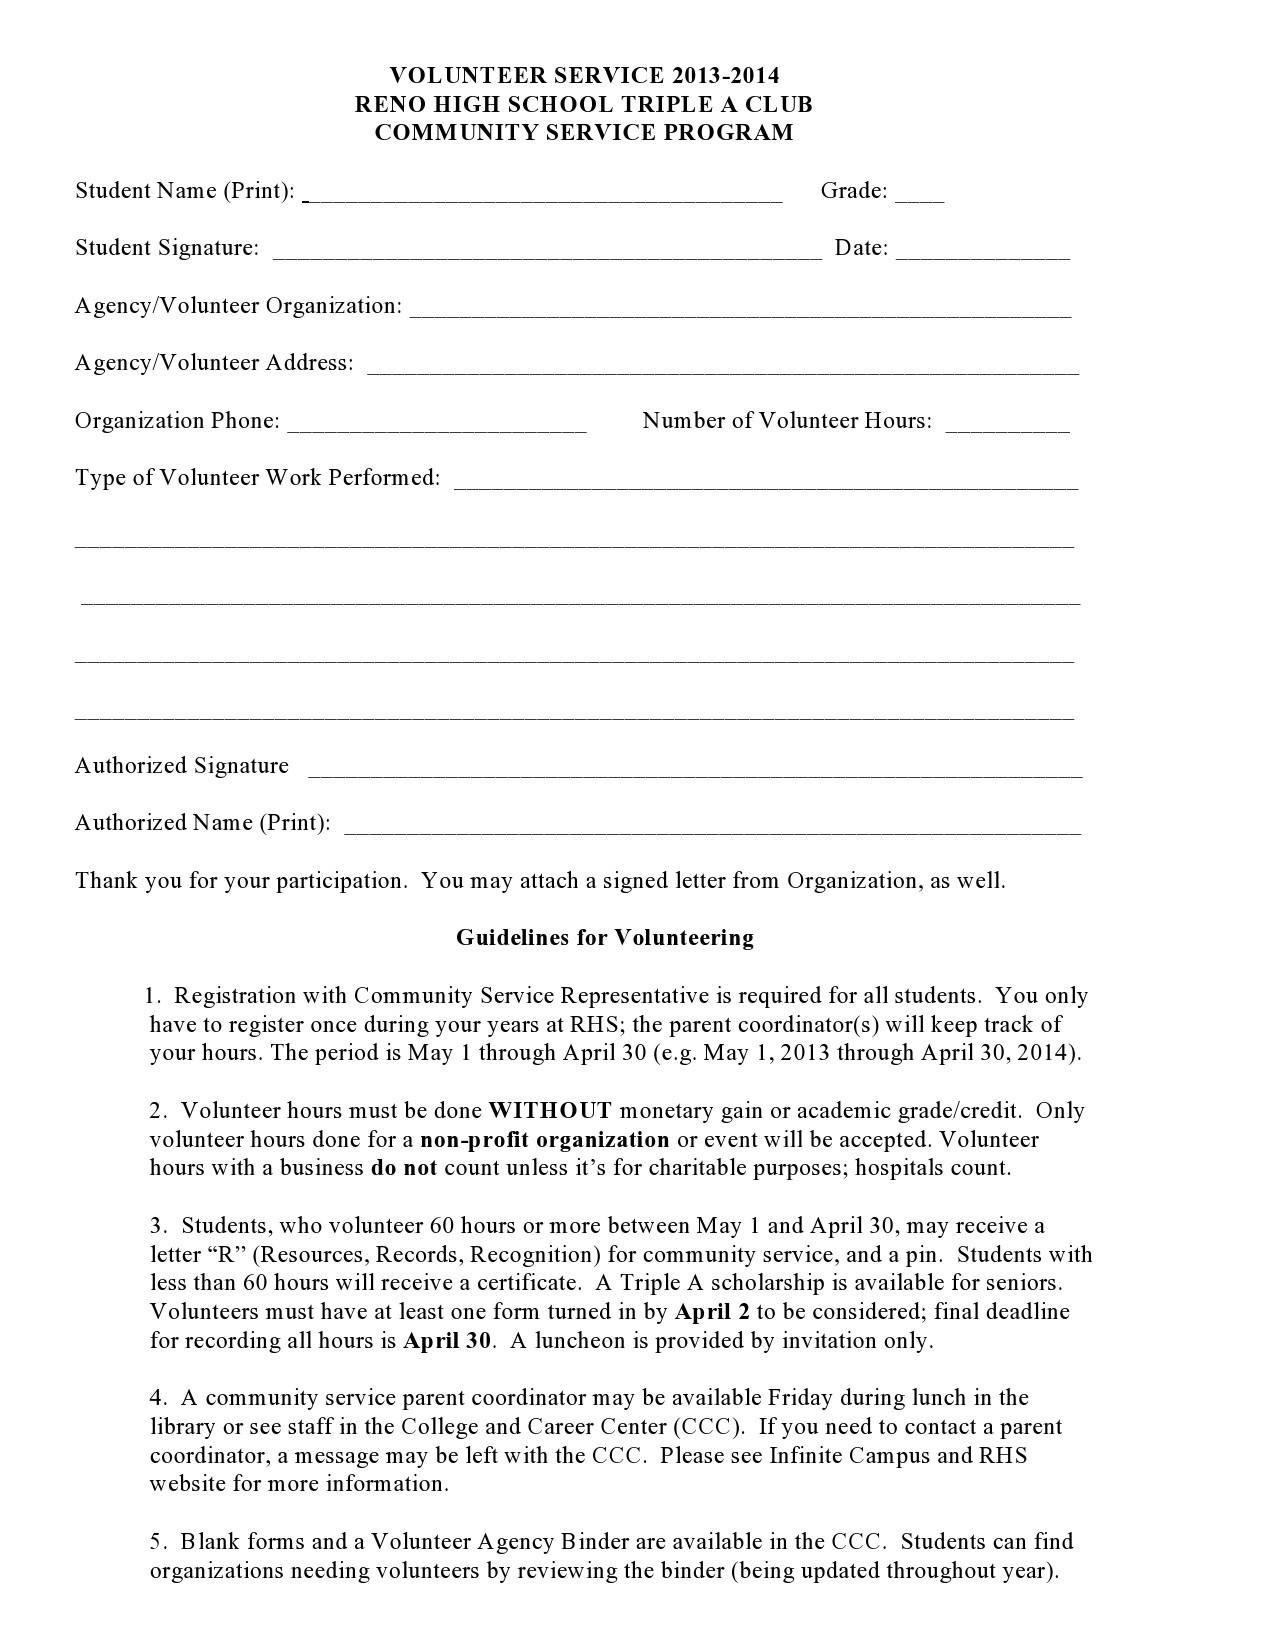 Volunteer Application Template from templatelab.com